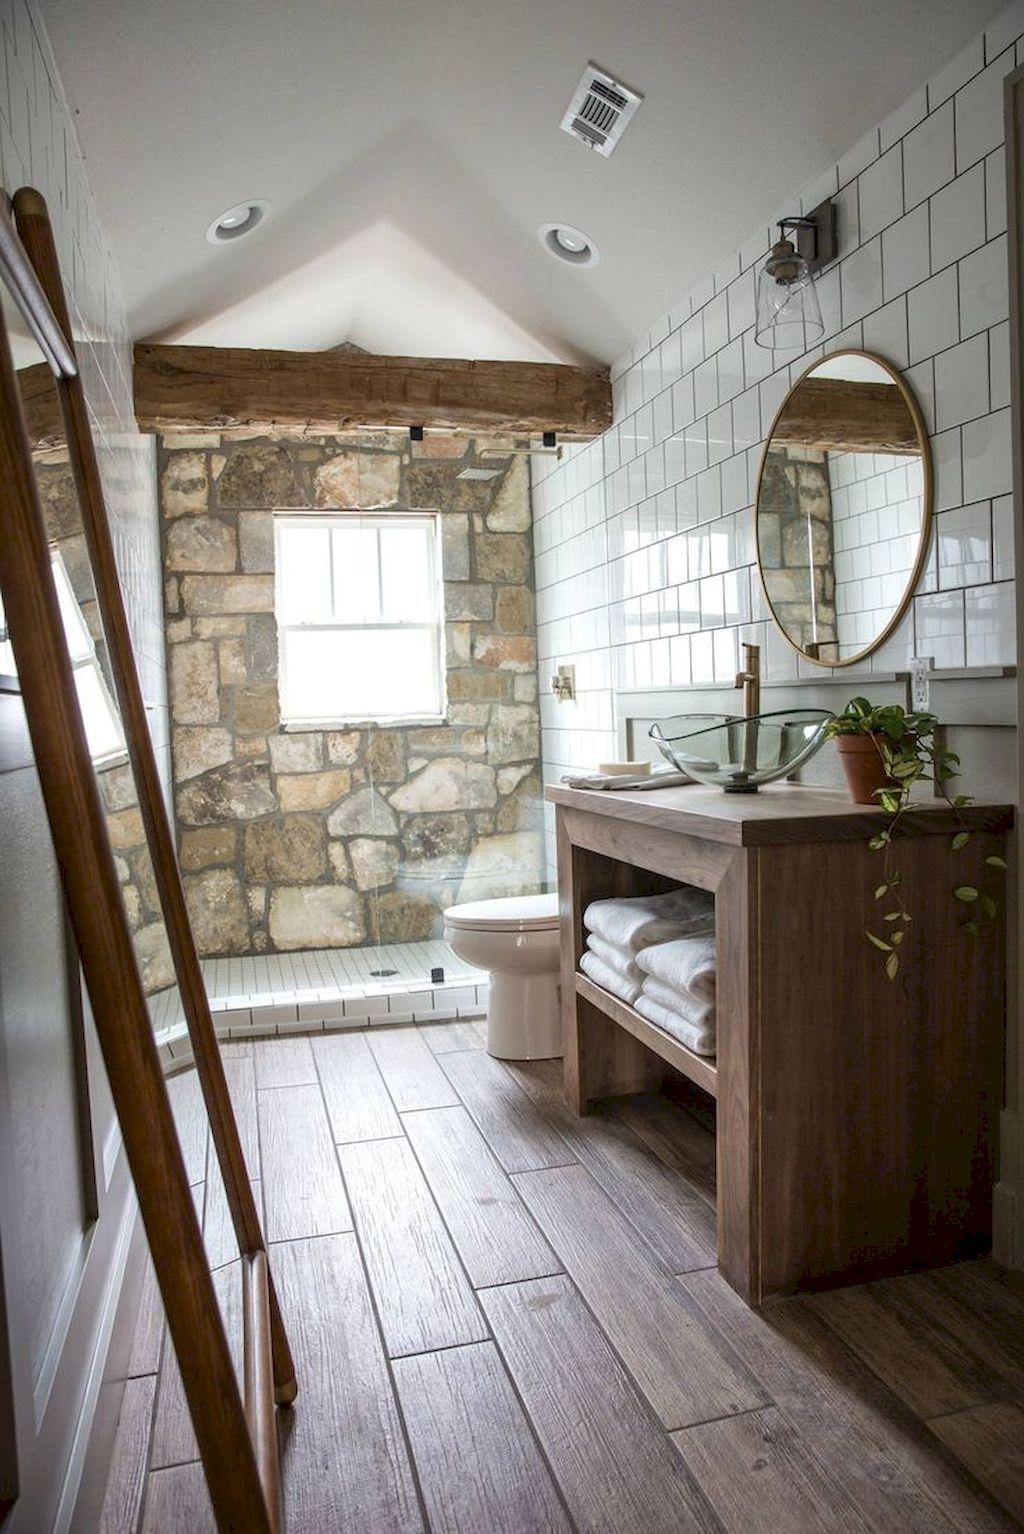 60 Rustic Master Bathroom Remodel Ideas